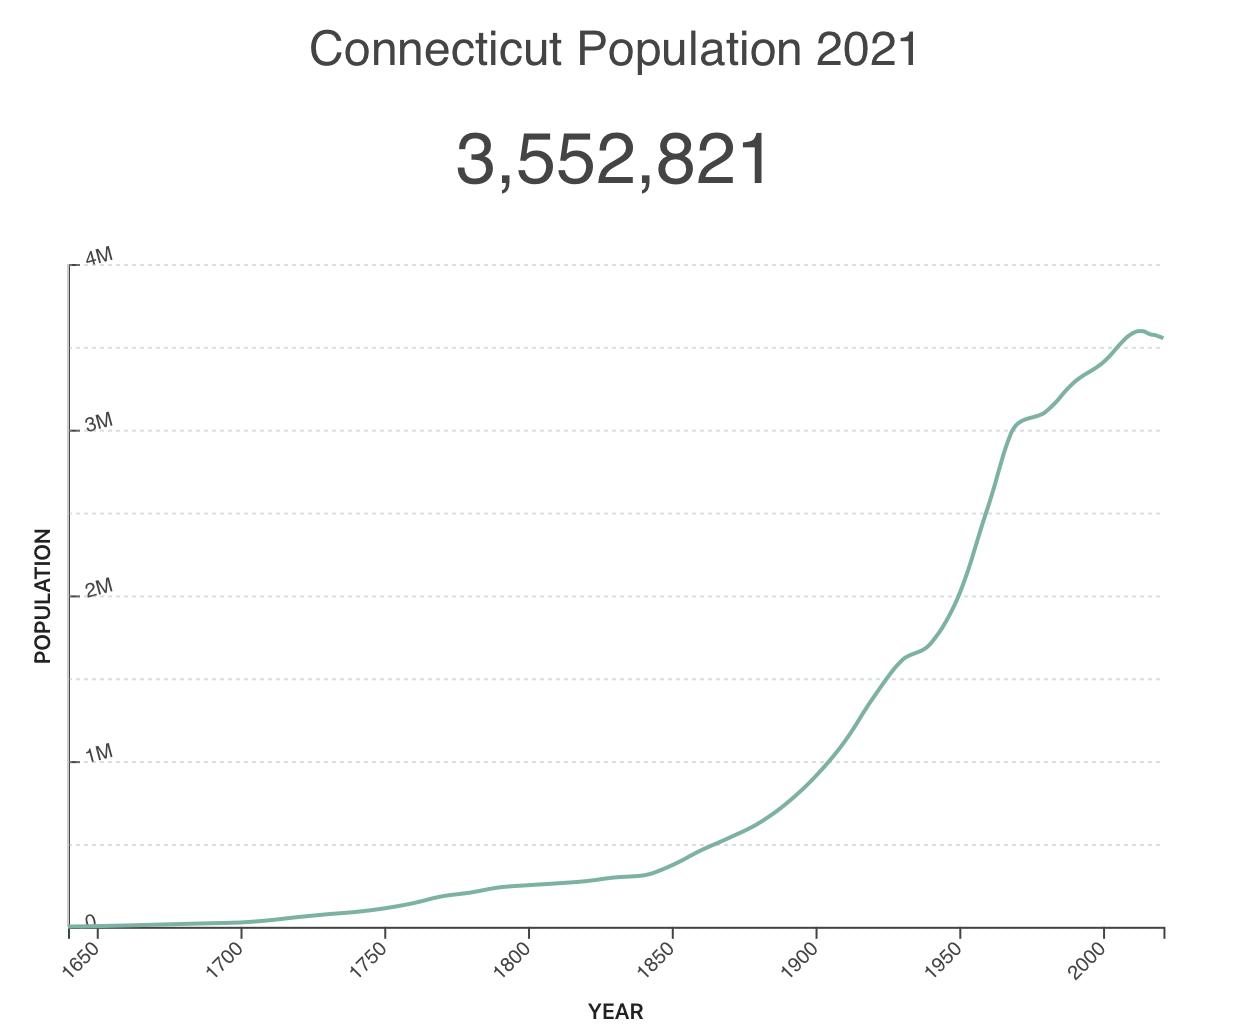 Connecticut real estate population